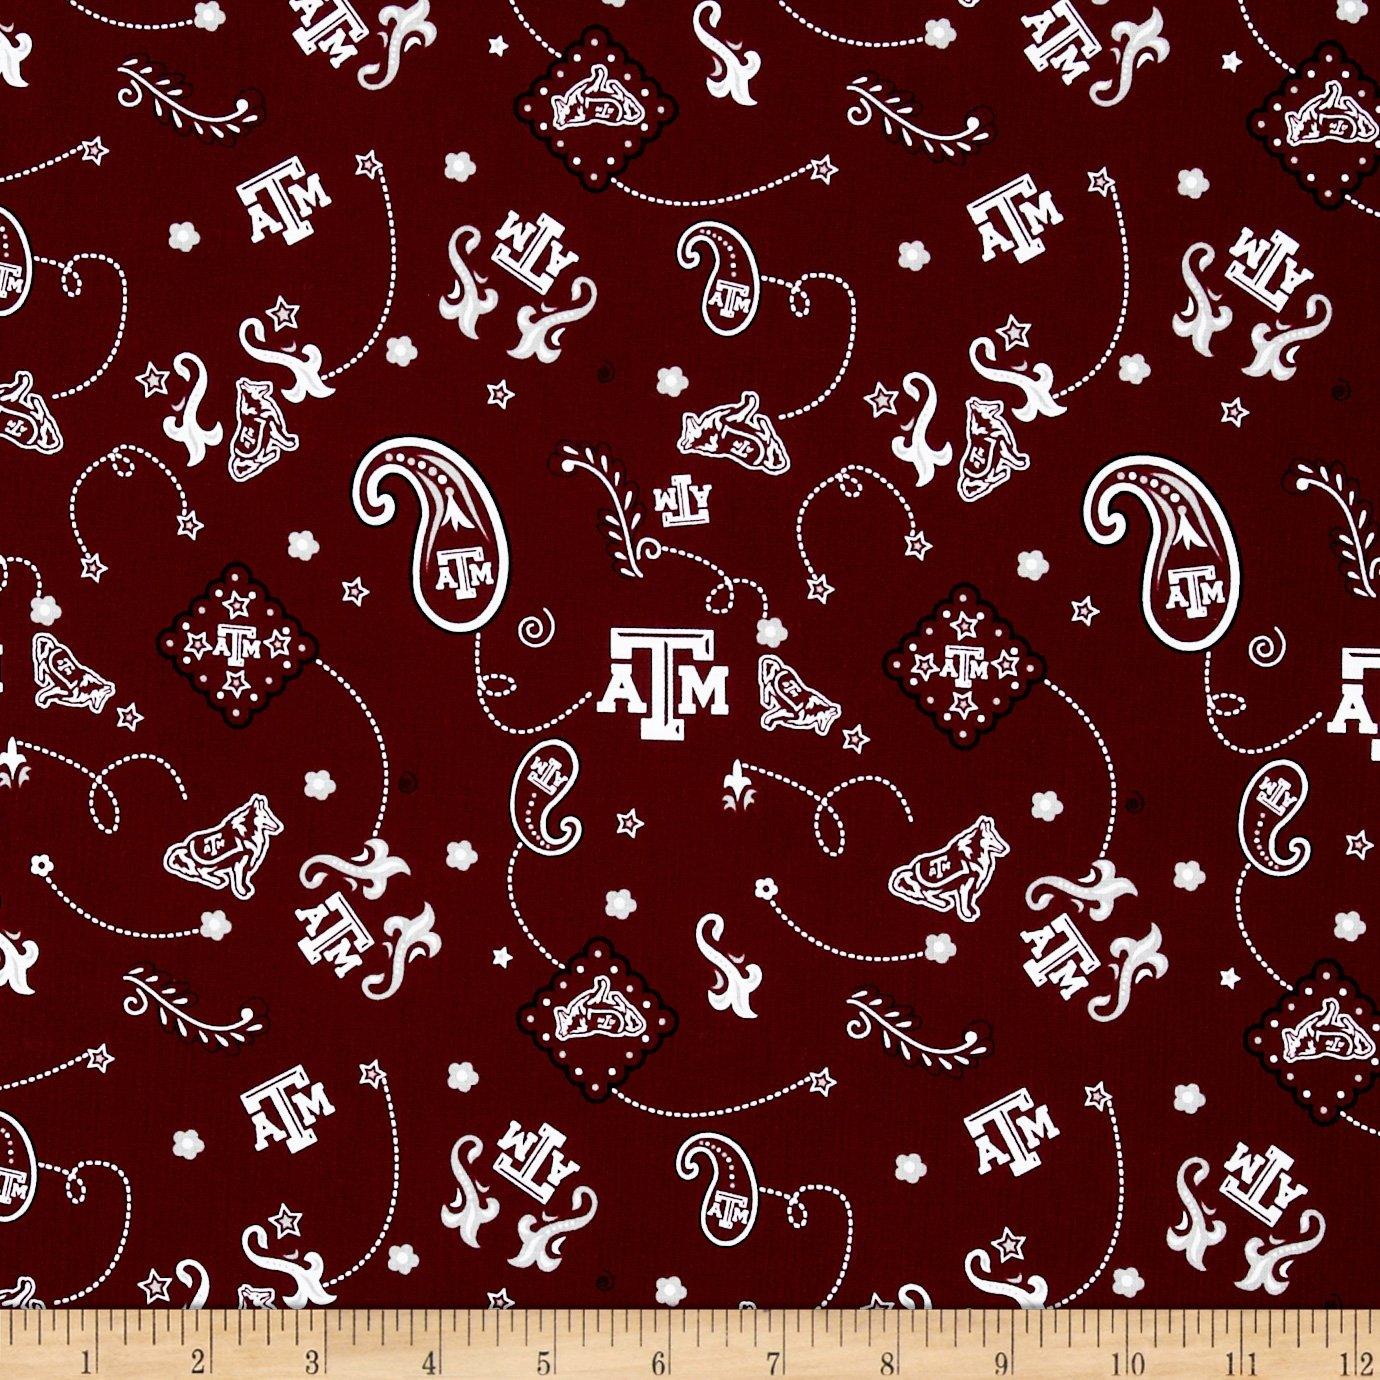 Collegiate Cotton Broadcloth Texas A&M Fabric by Sykel Enterprises   B00EQCVTYE